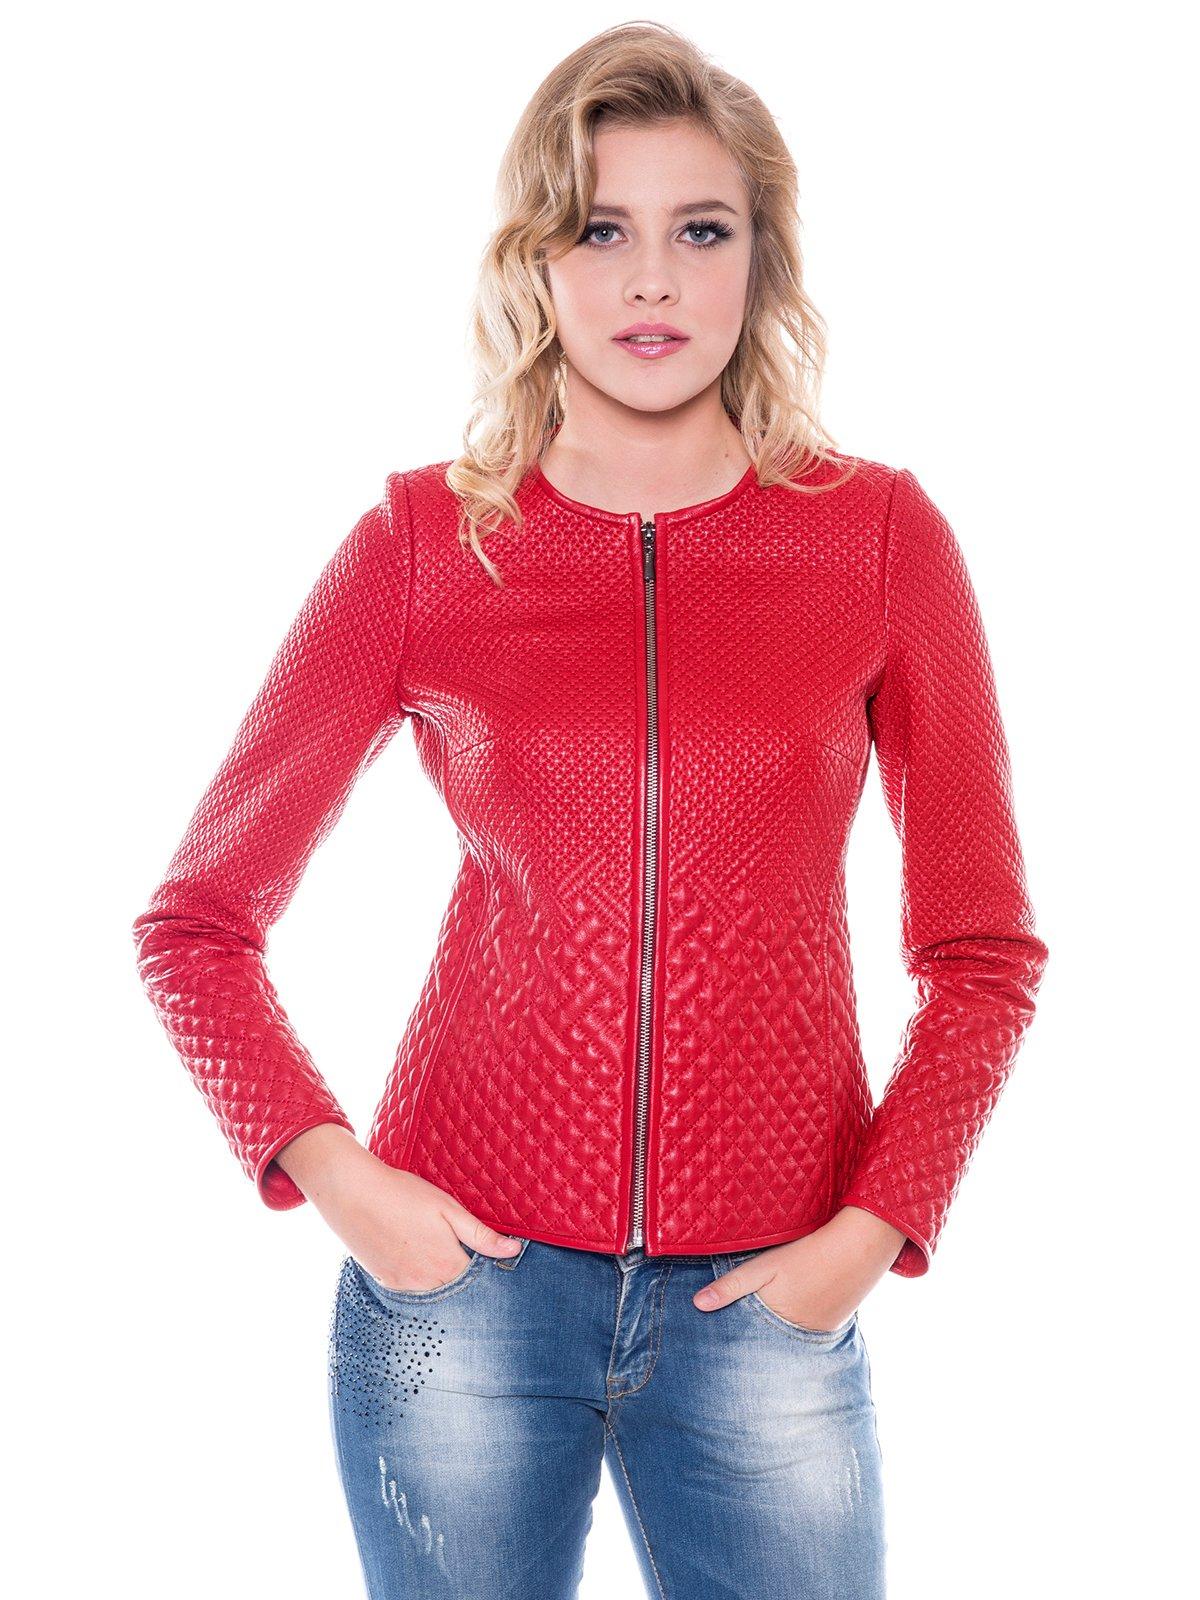 Куртка красная   2033764   фото 2